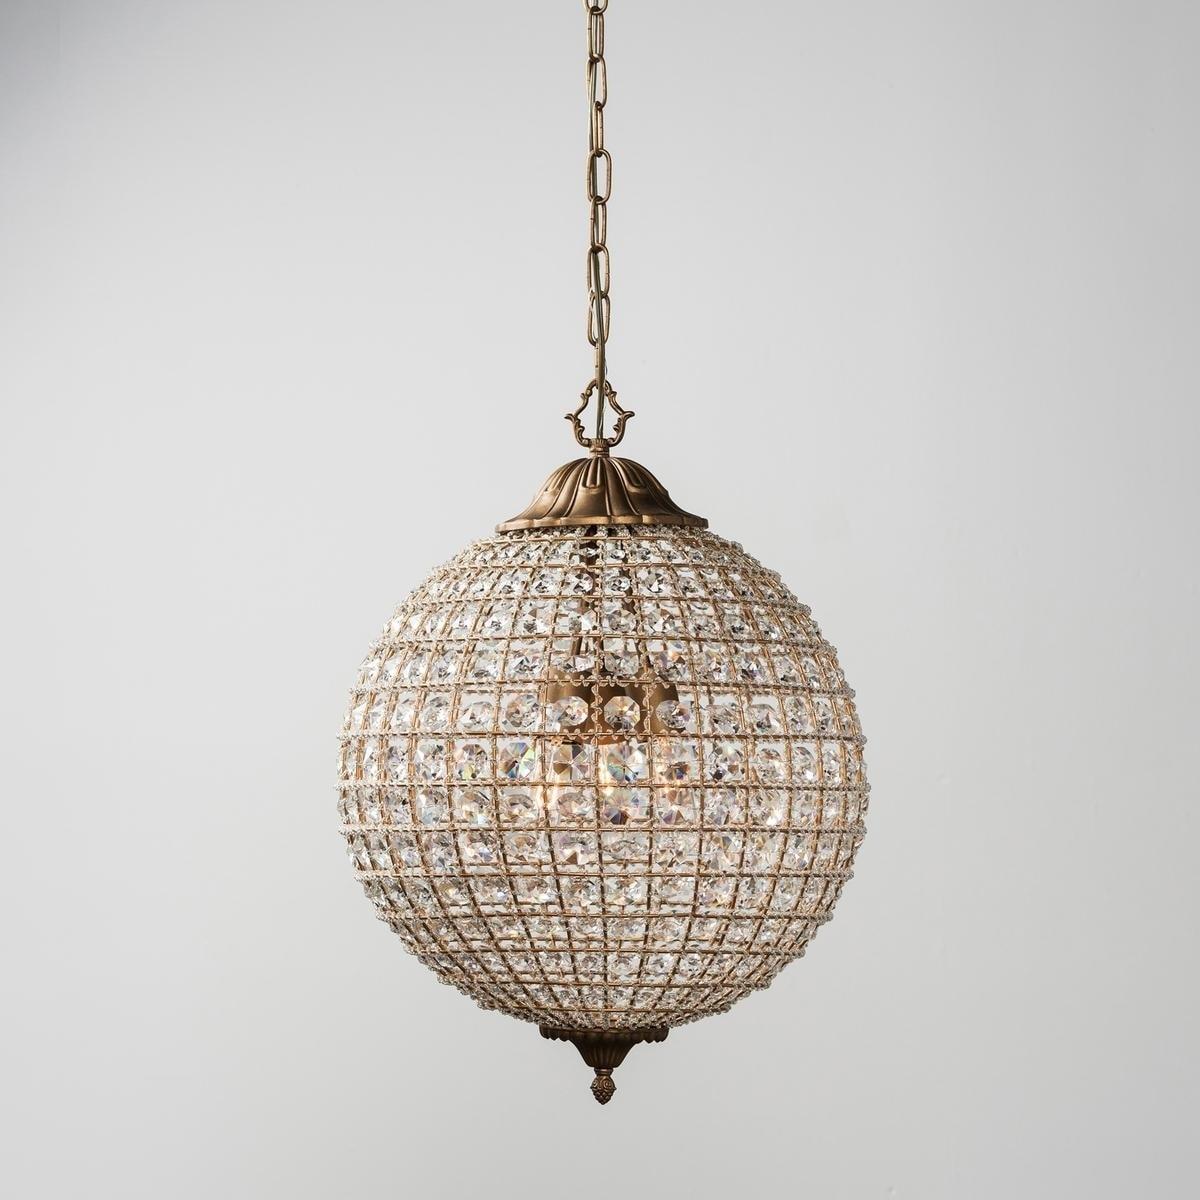 3 Light 18 Inch Medium Globe Chandelier